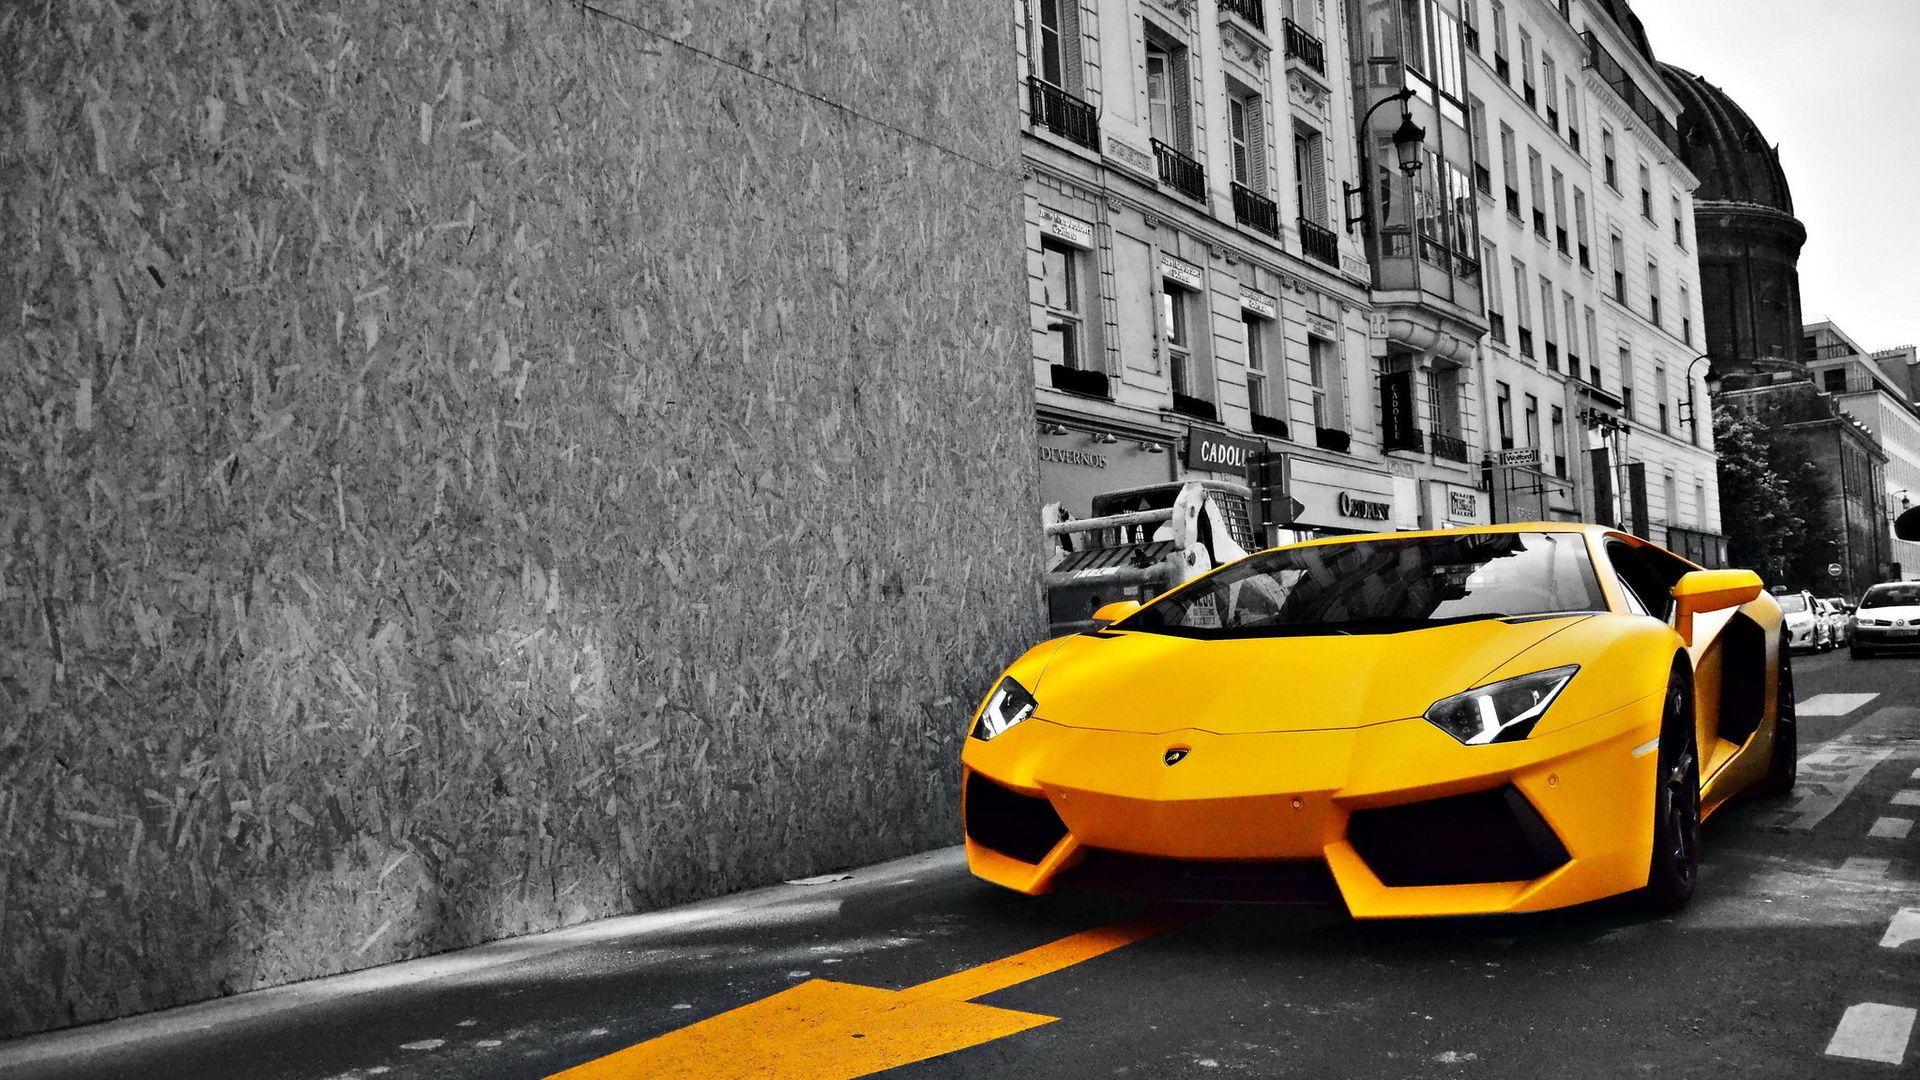 Lamborghini Aventador 1366x768 Hd Wallpaper Black And White Google Search Lamborghini Aventador Wallpaper Lamborghini Aventador Lamborghini Gallardo